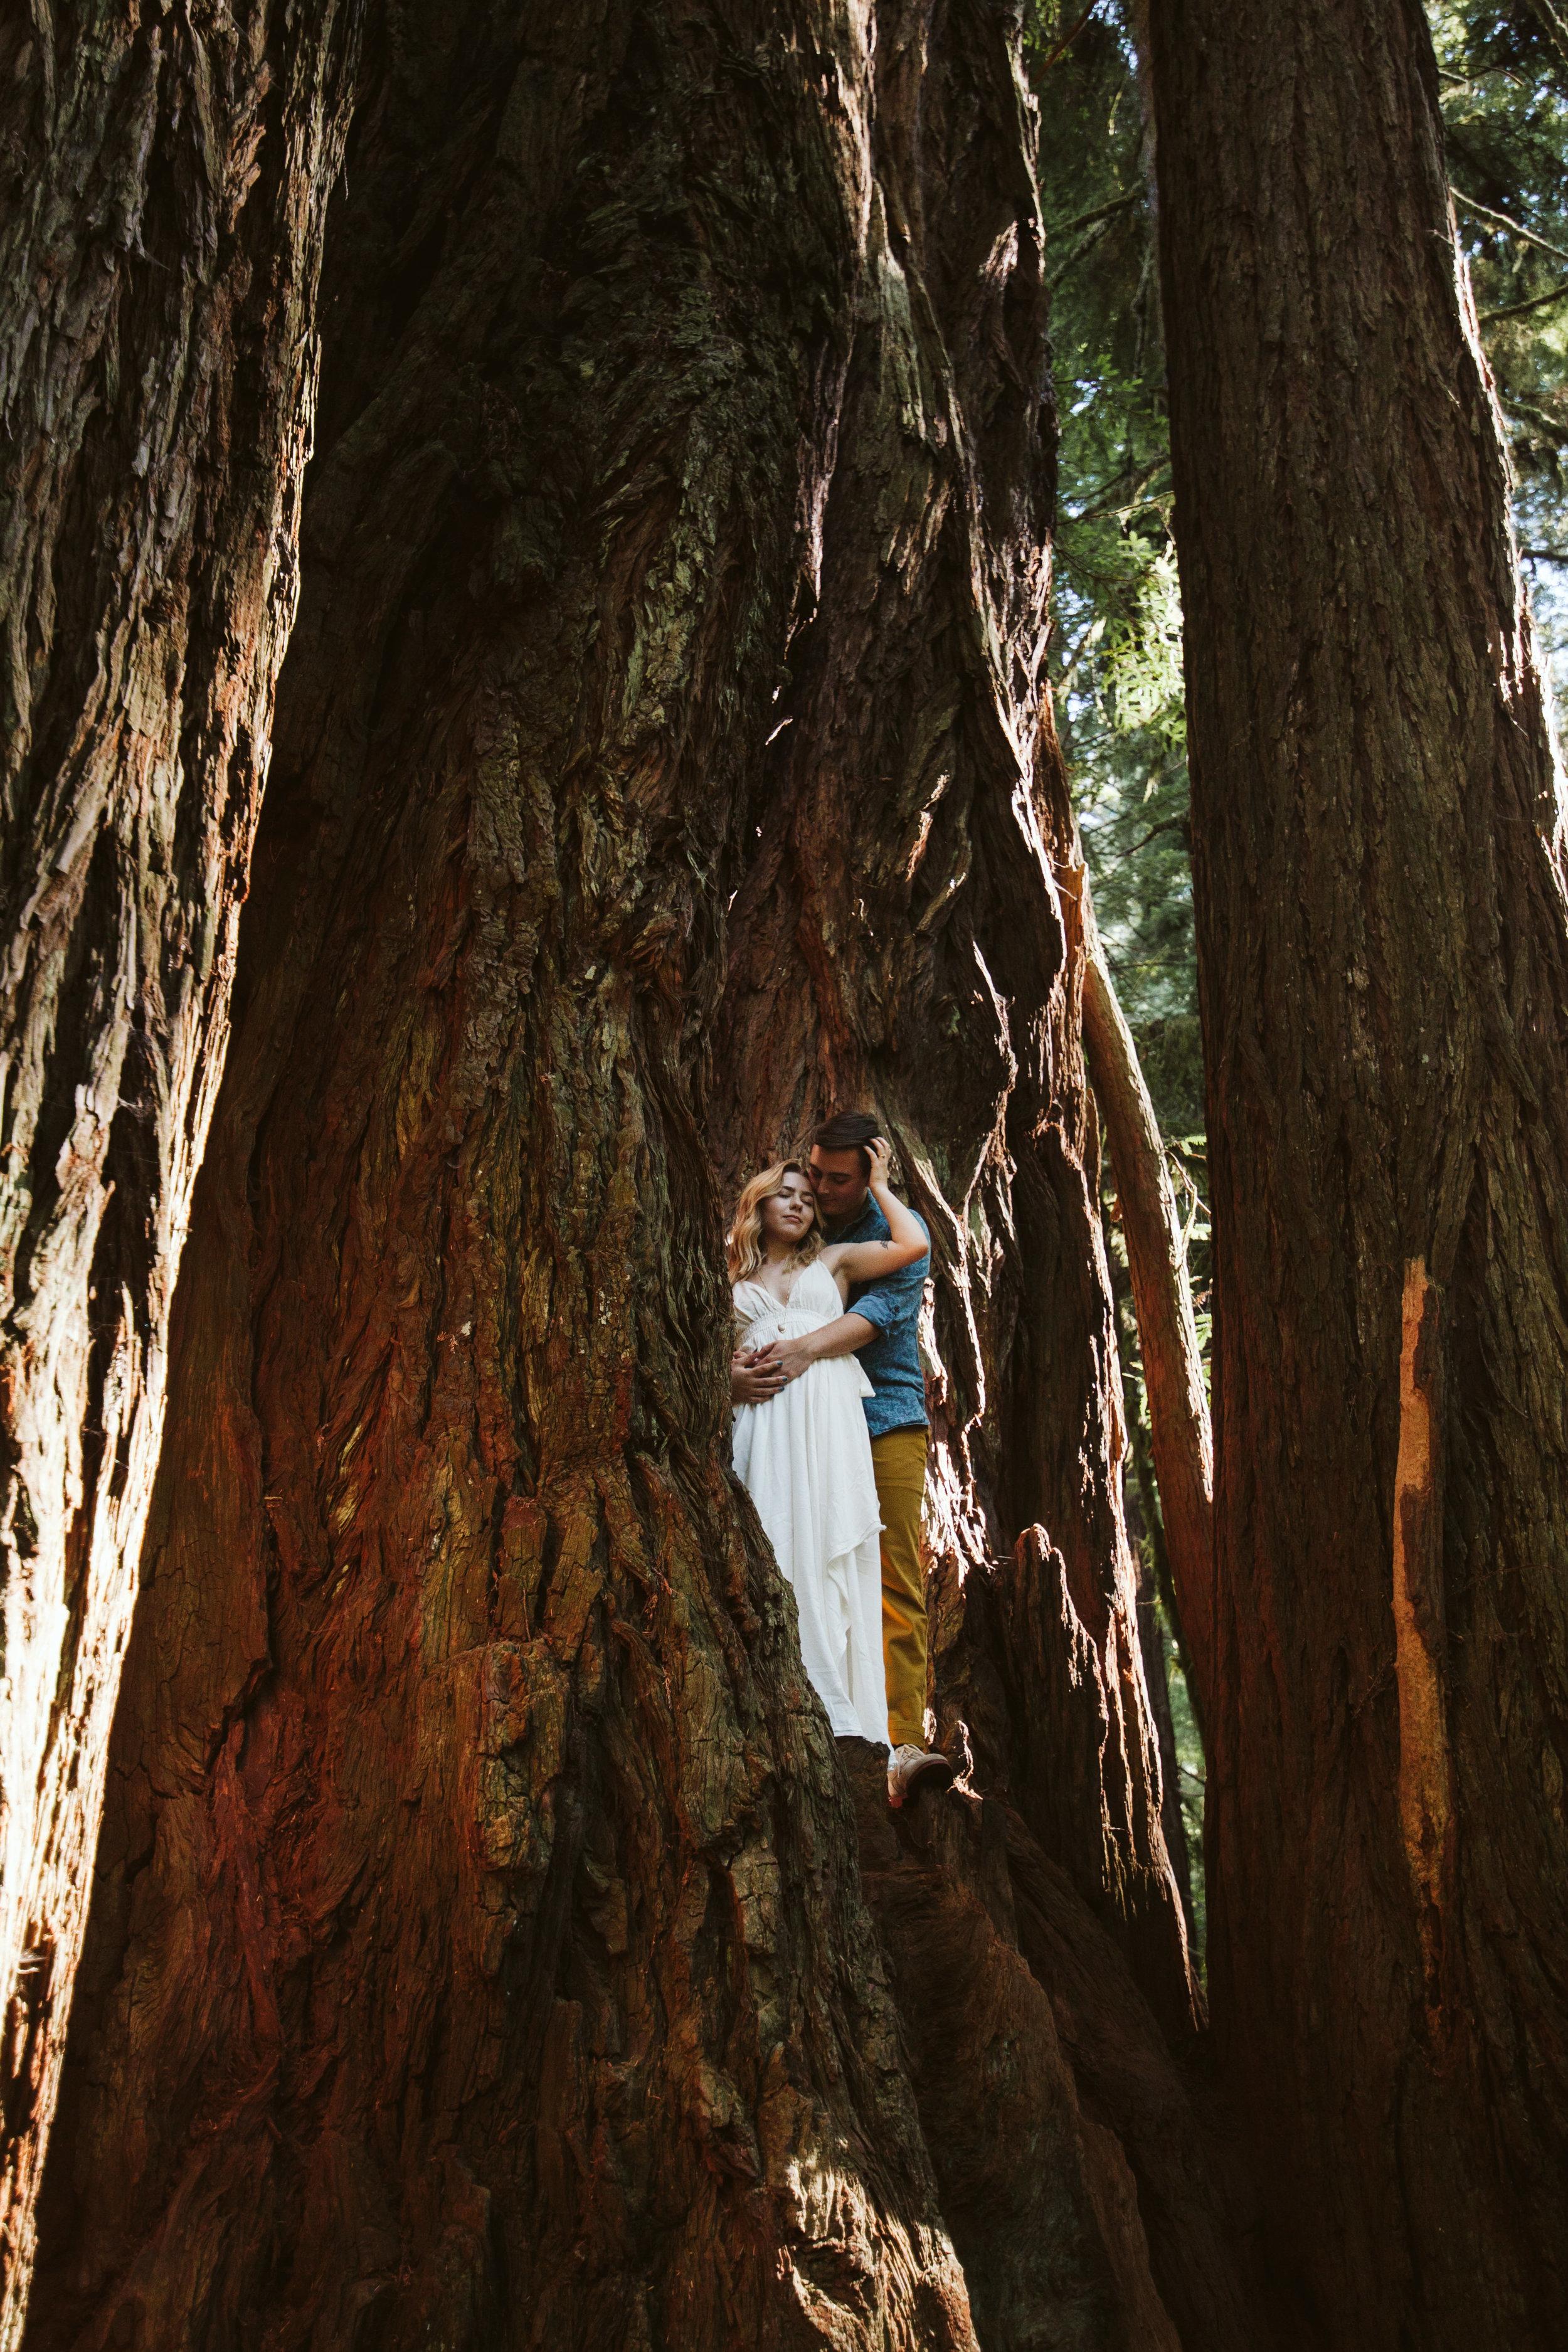 Hannah&Ben_Redwoods_Elopement_Engagement_PNW_SouthernOregon_NorthernCalifornia_ (12 of 23).jpg